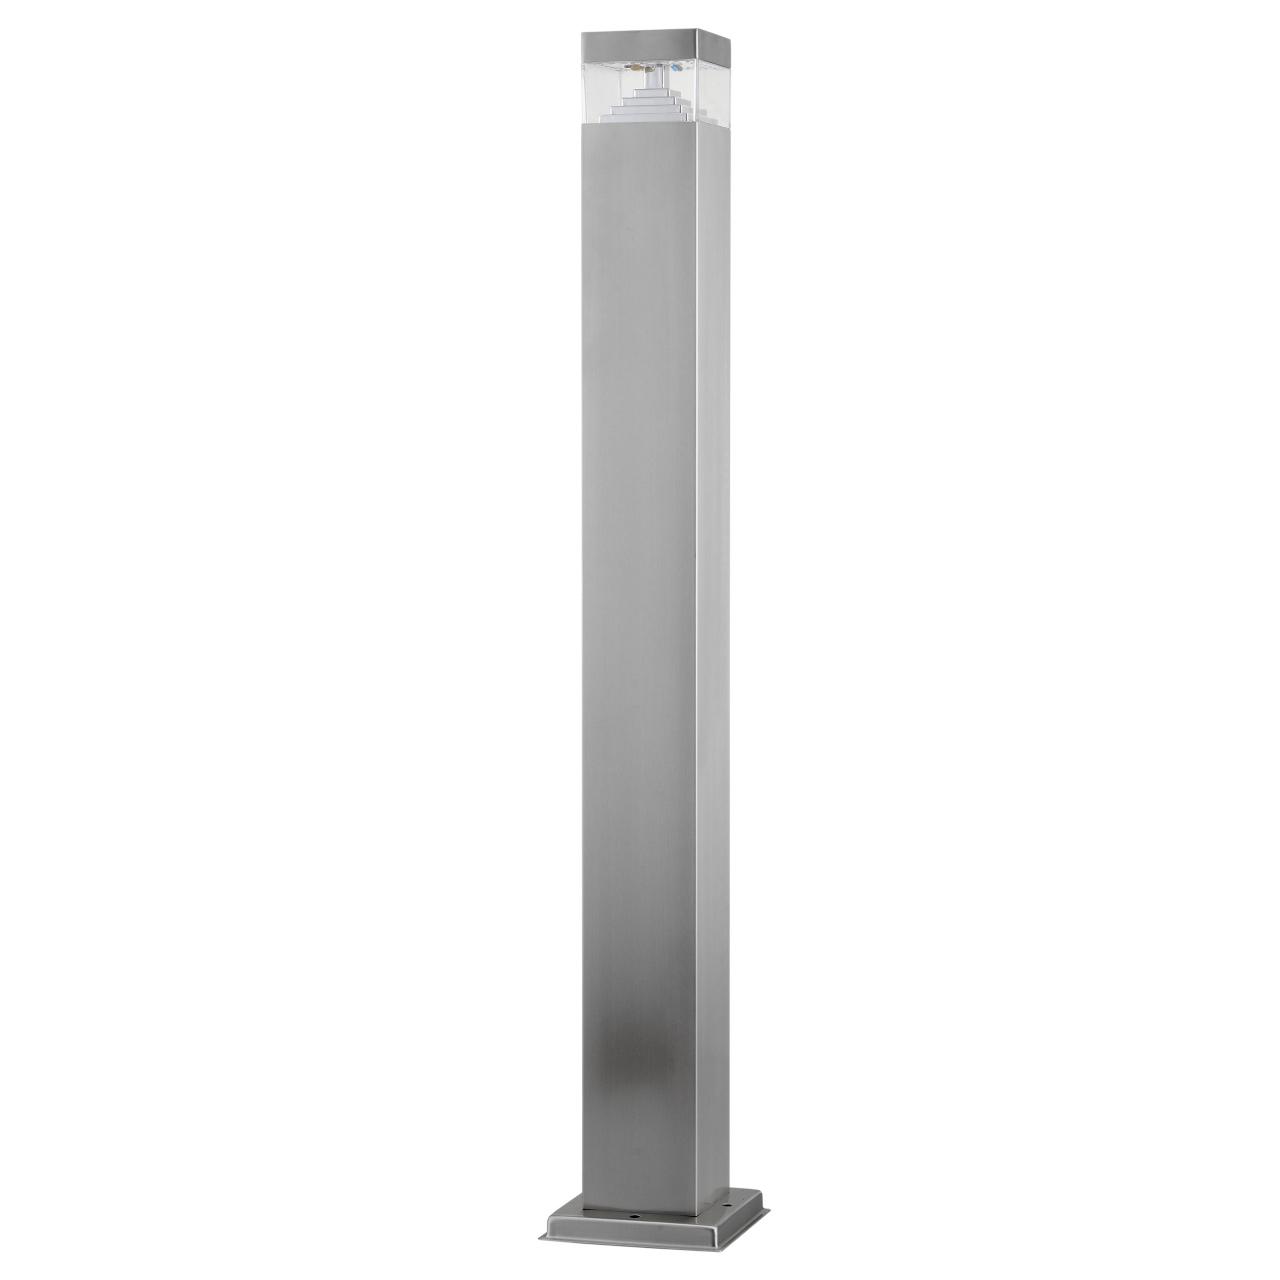 Светильник Raggio LED 6W 300LM алюминий 4000K IP55 Lightstar 377705